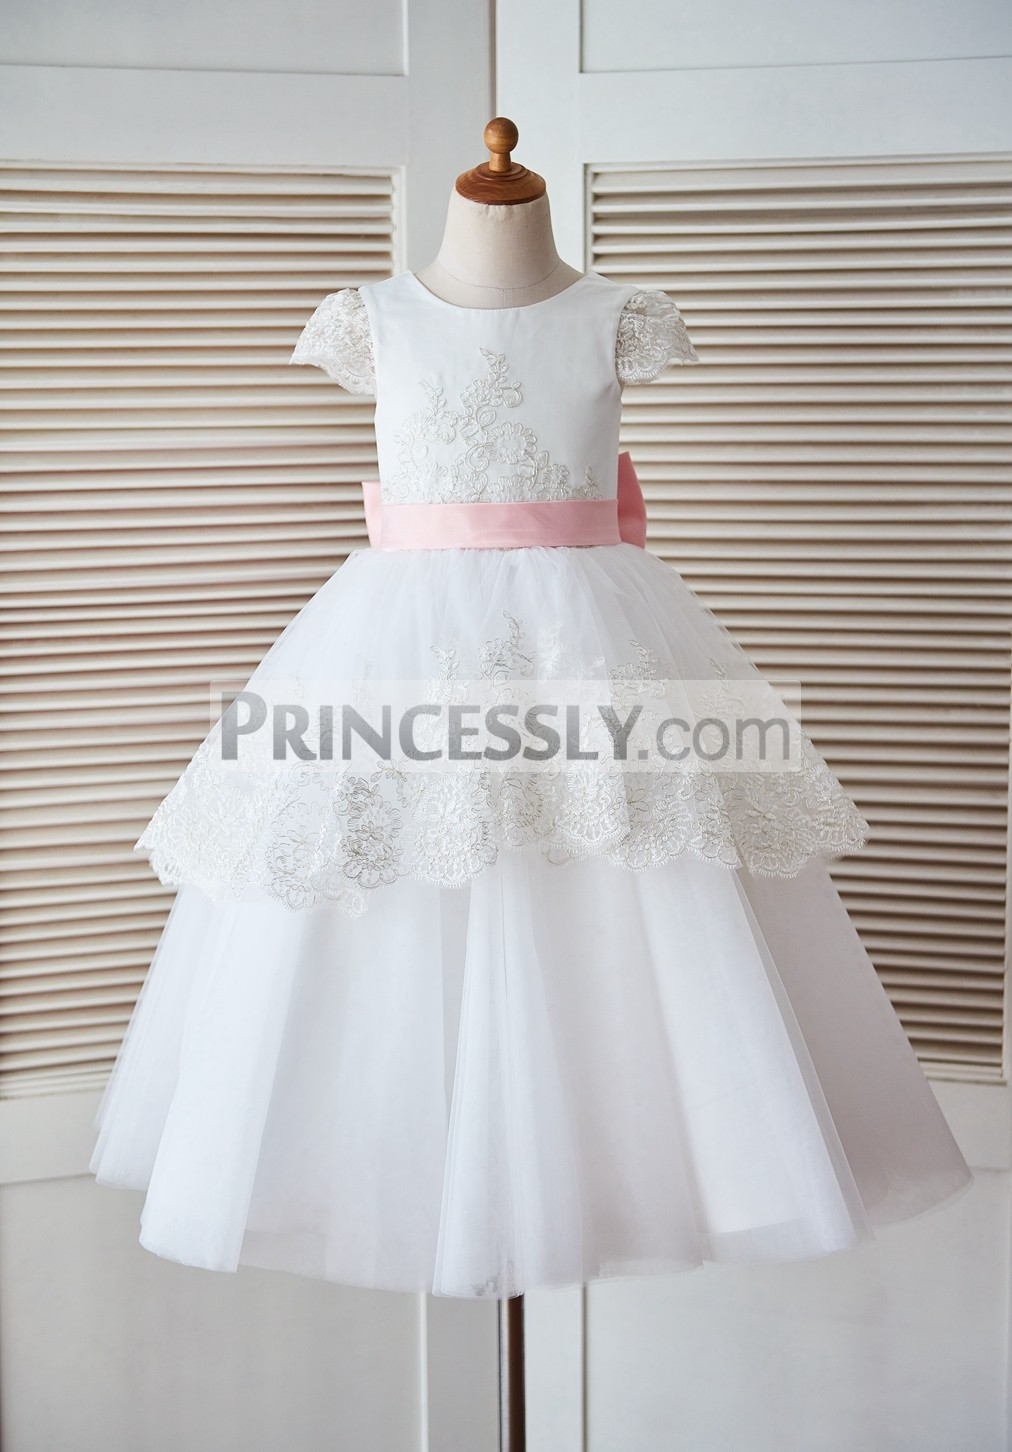 cap sleeves lace tulle satin cupcake flower girl dress